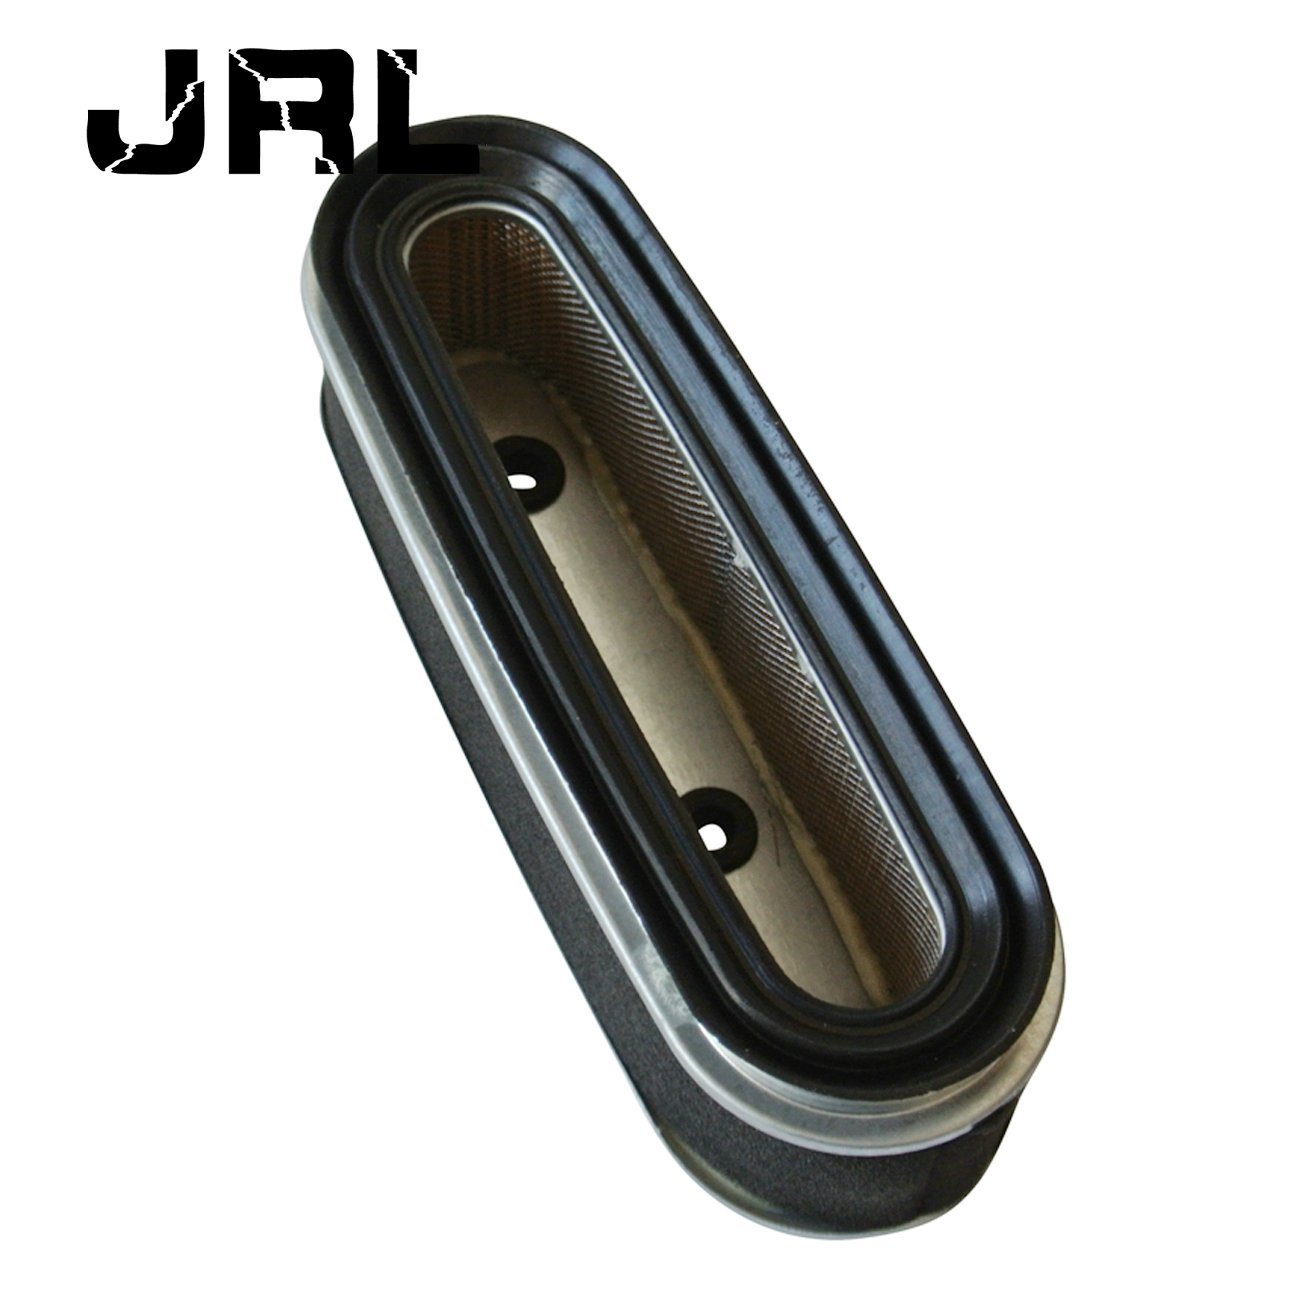 JRL Air Filter Fits Honda GXV160 HRC216K1HA 17210-Z1V-003